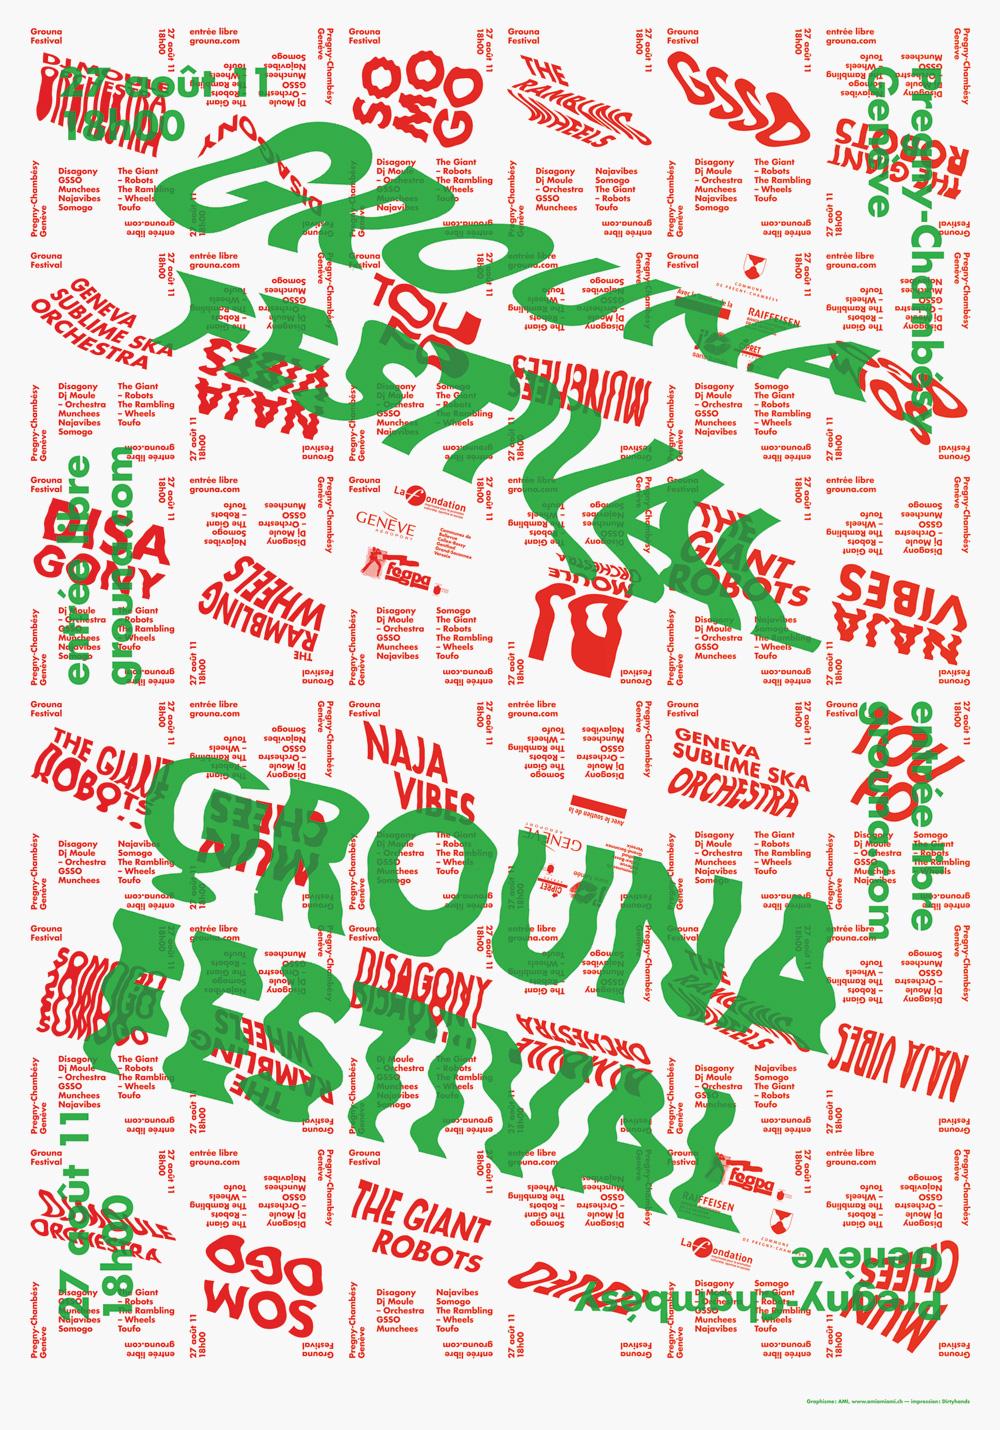 AMI-grouna-festival-poster